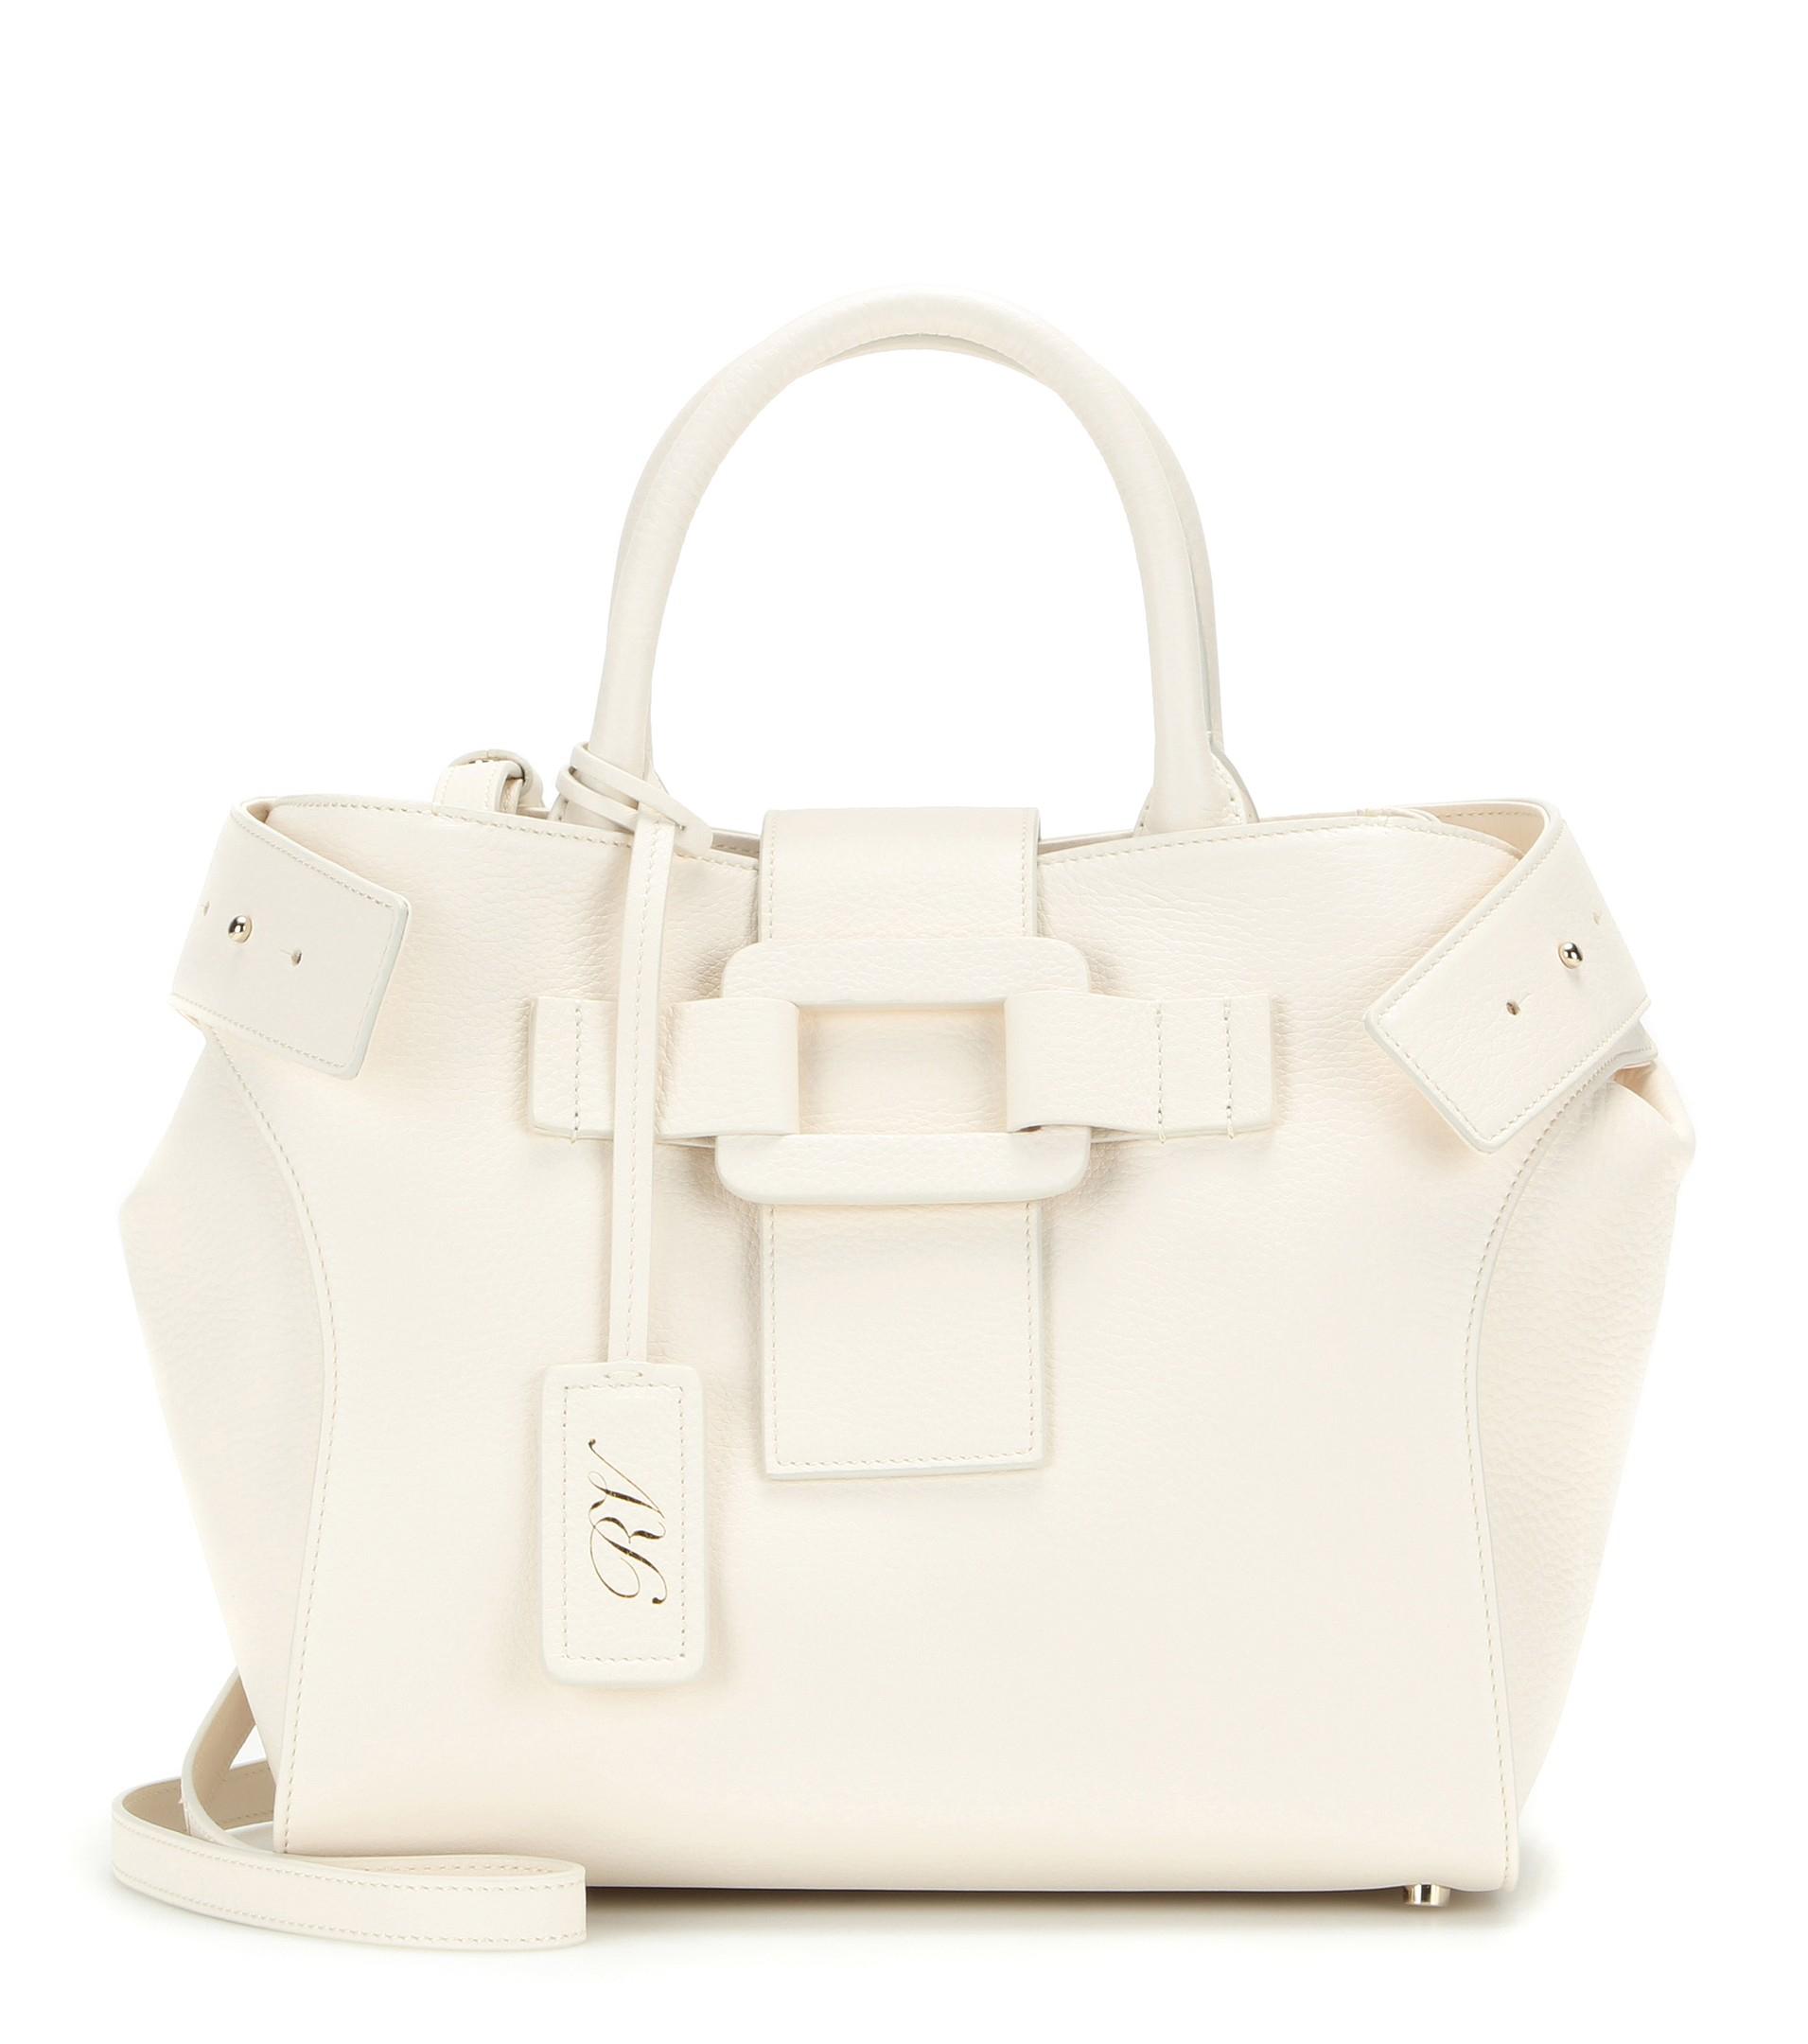 Lyst - Roger Vivier Pilgrim De Jour Small Leather Shoulder Bag in White 84da141550cda